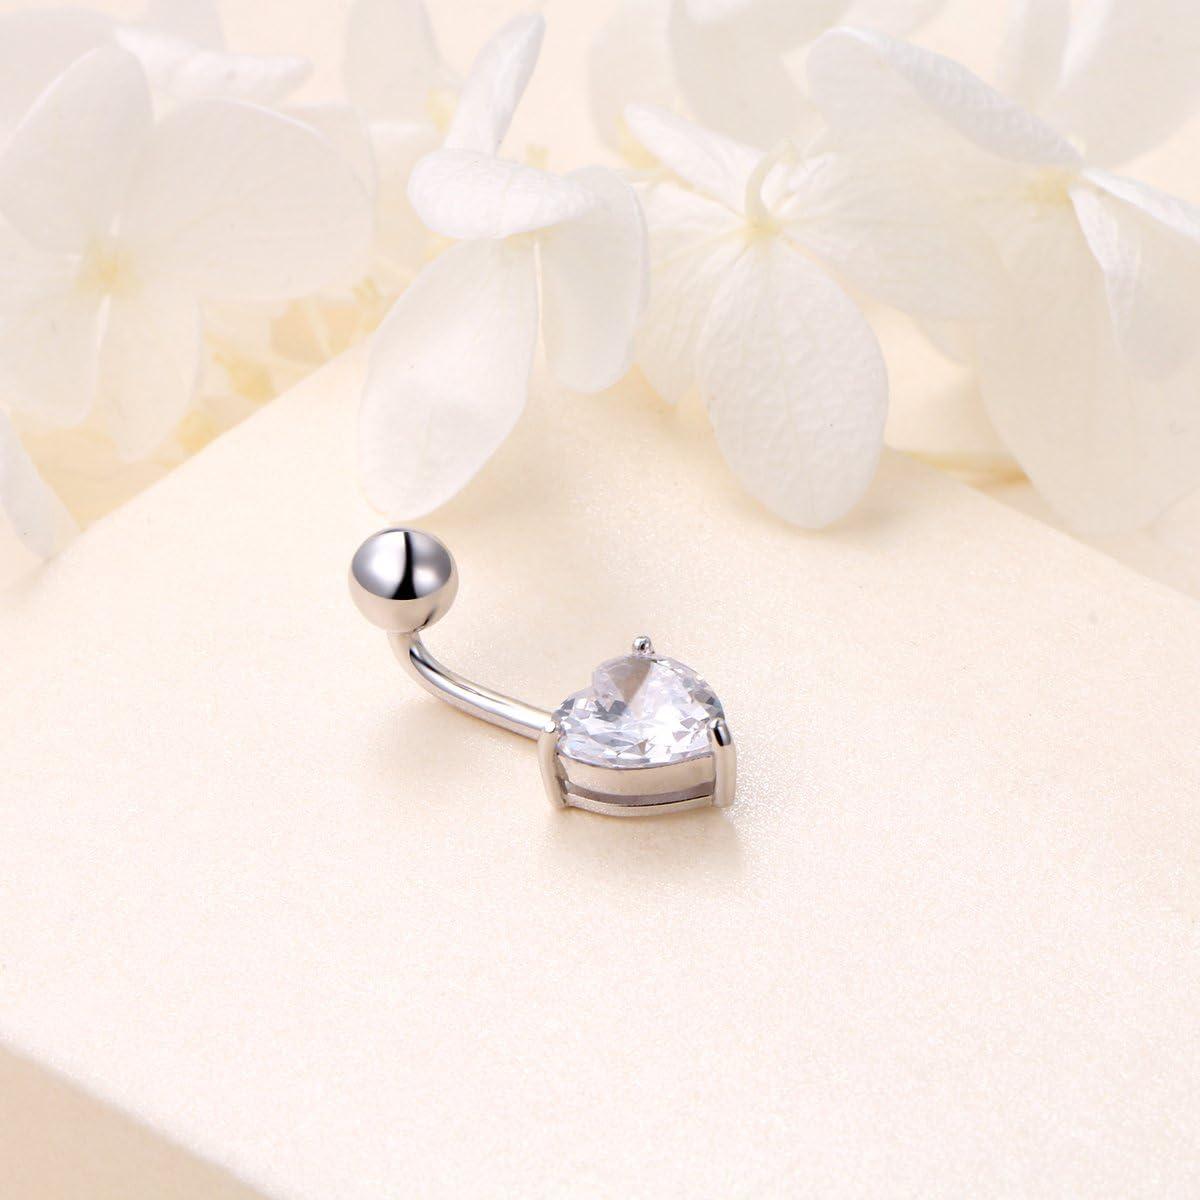 Sterling Silver Belly Button Rings for Women Girl Navel Rings CZ Body Piercing